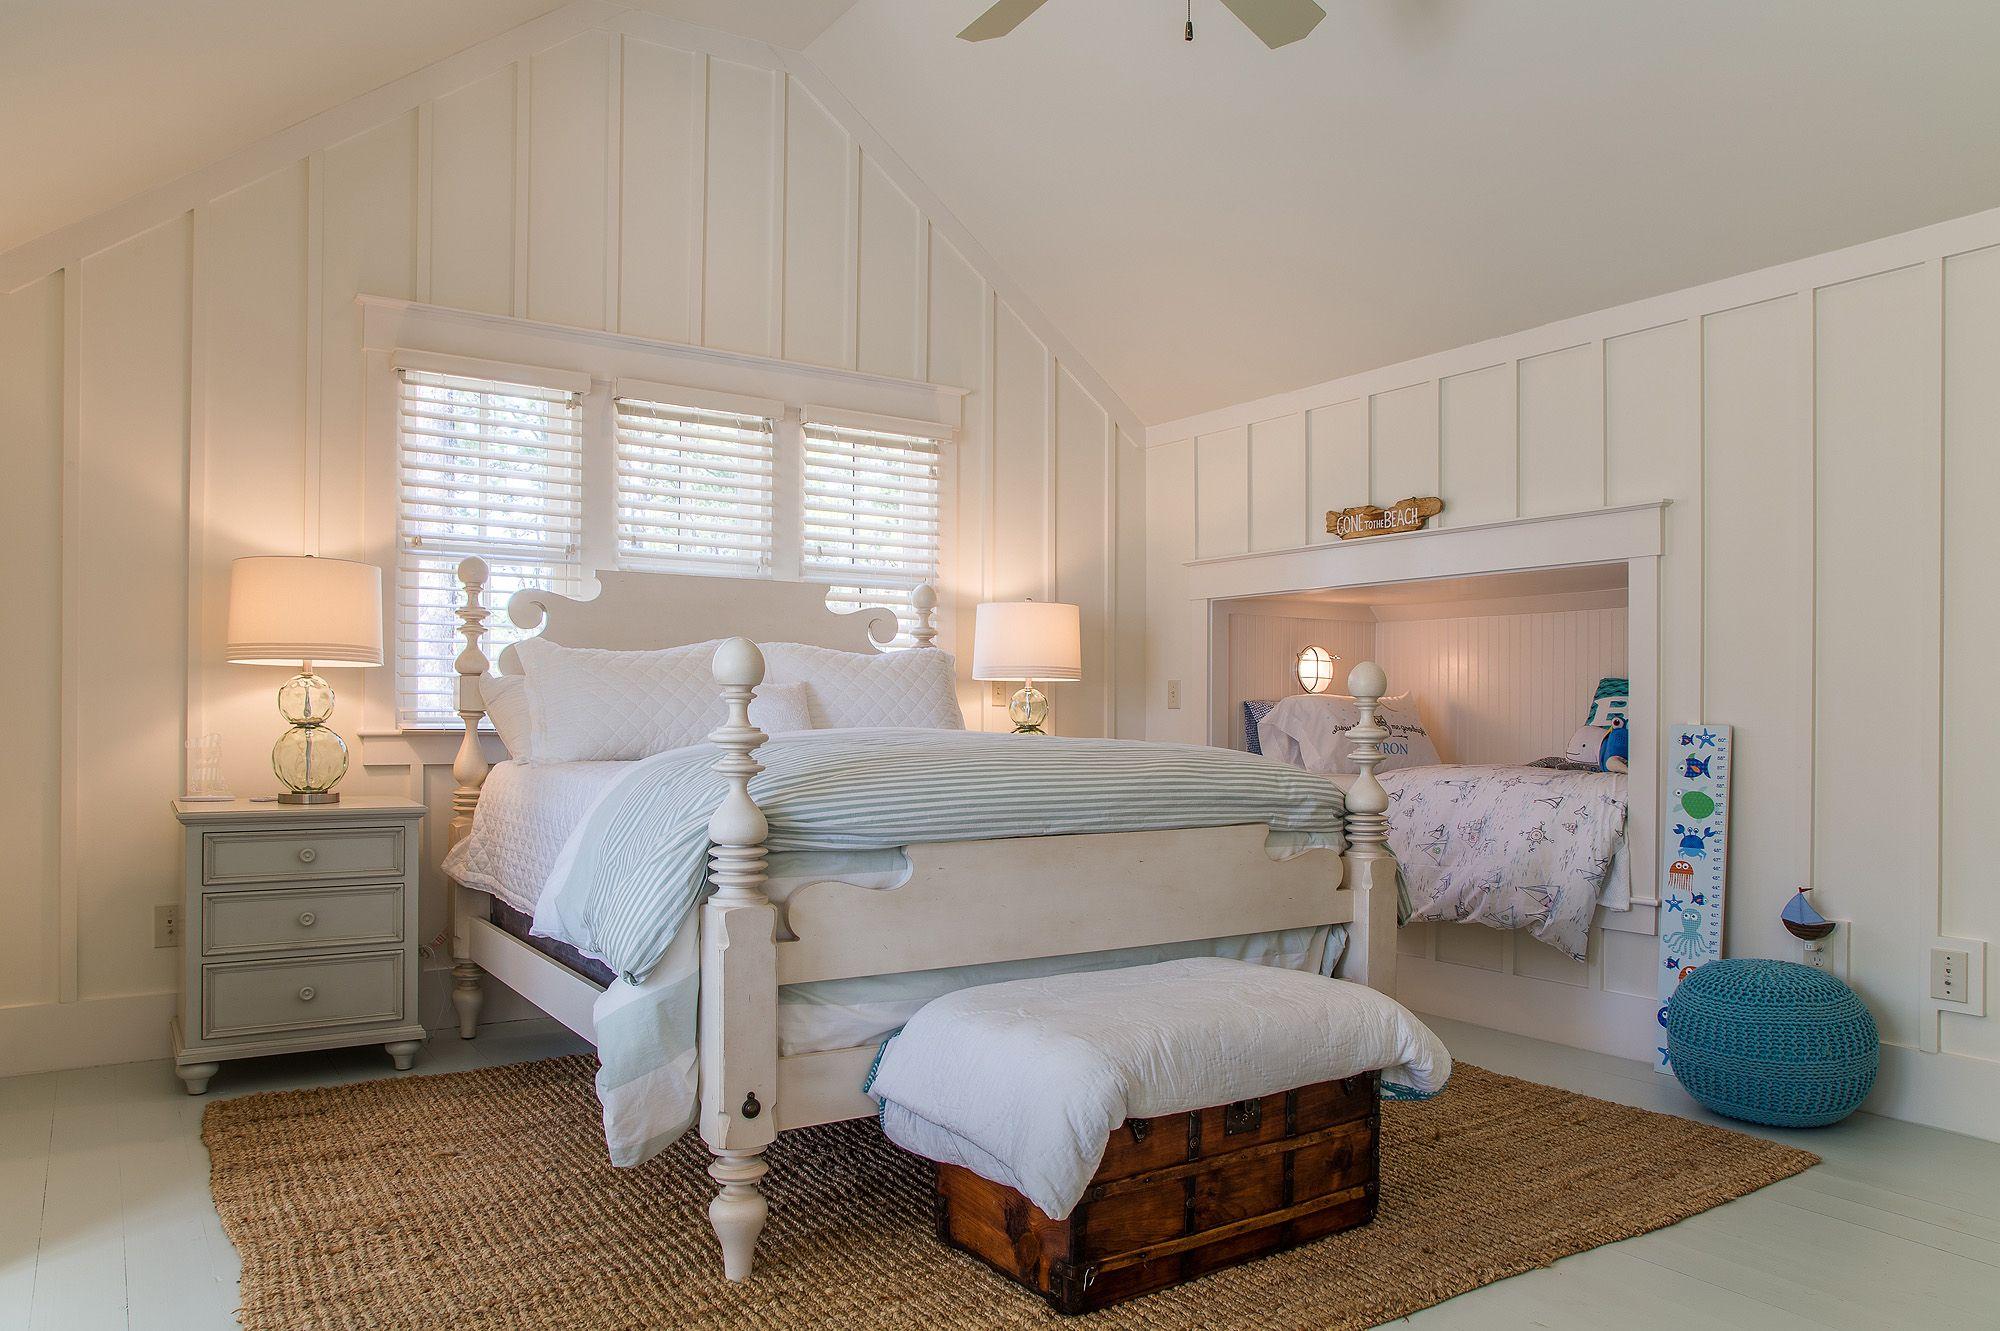 Bed Nook, Bedroom Decor